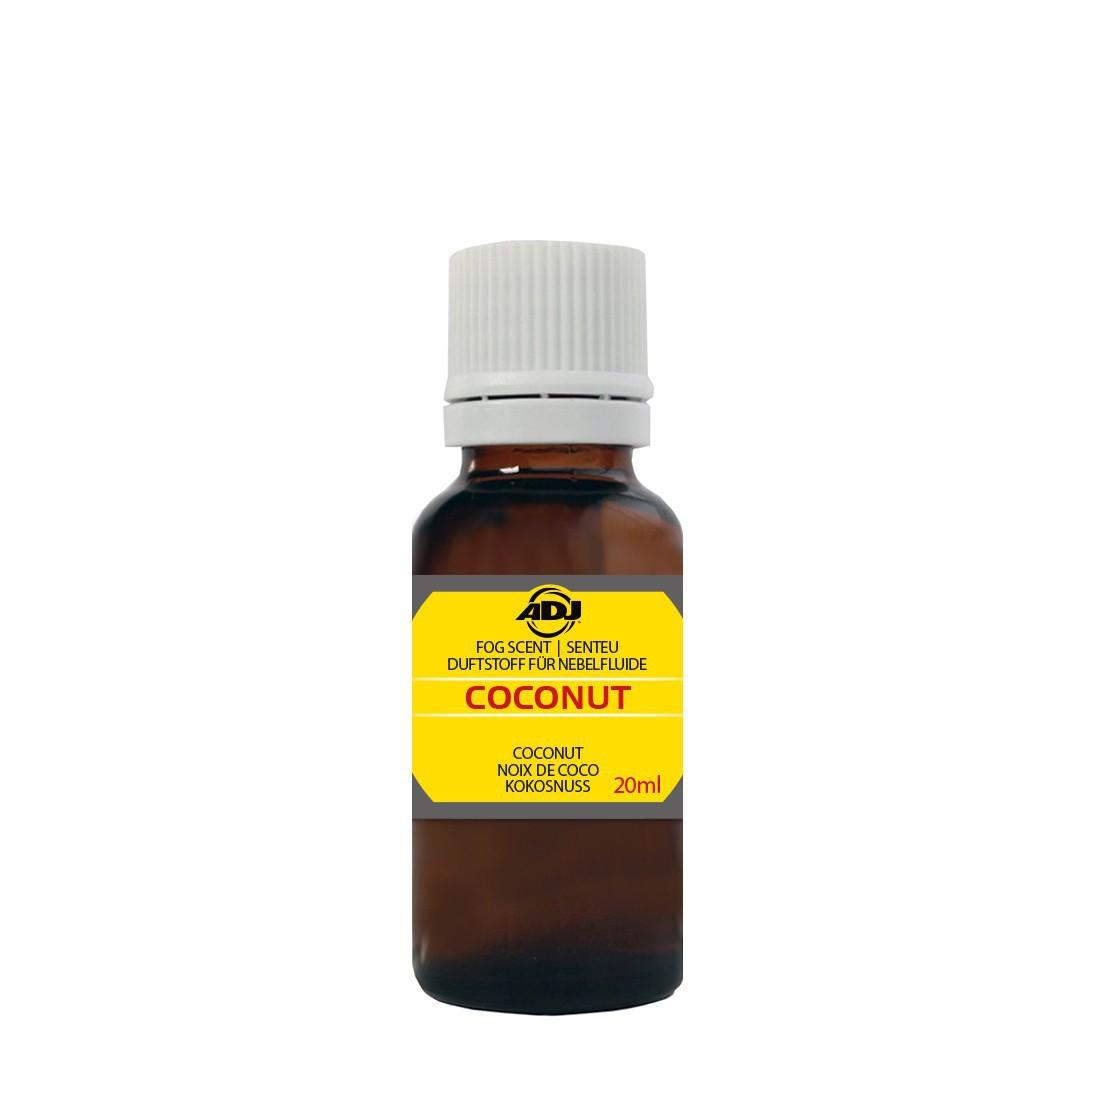 American DJ fog scent coconut 20ml - Zapach do dymu